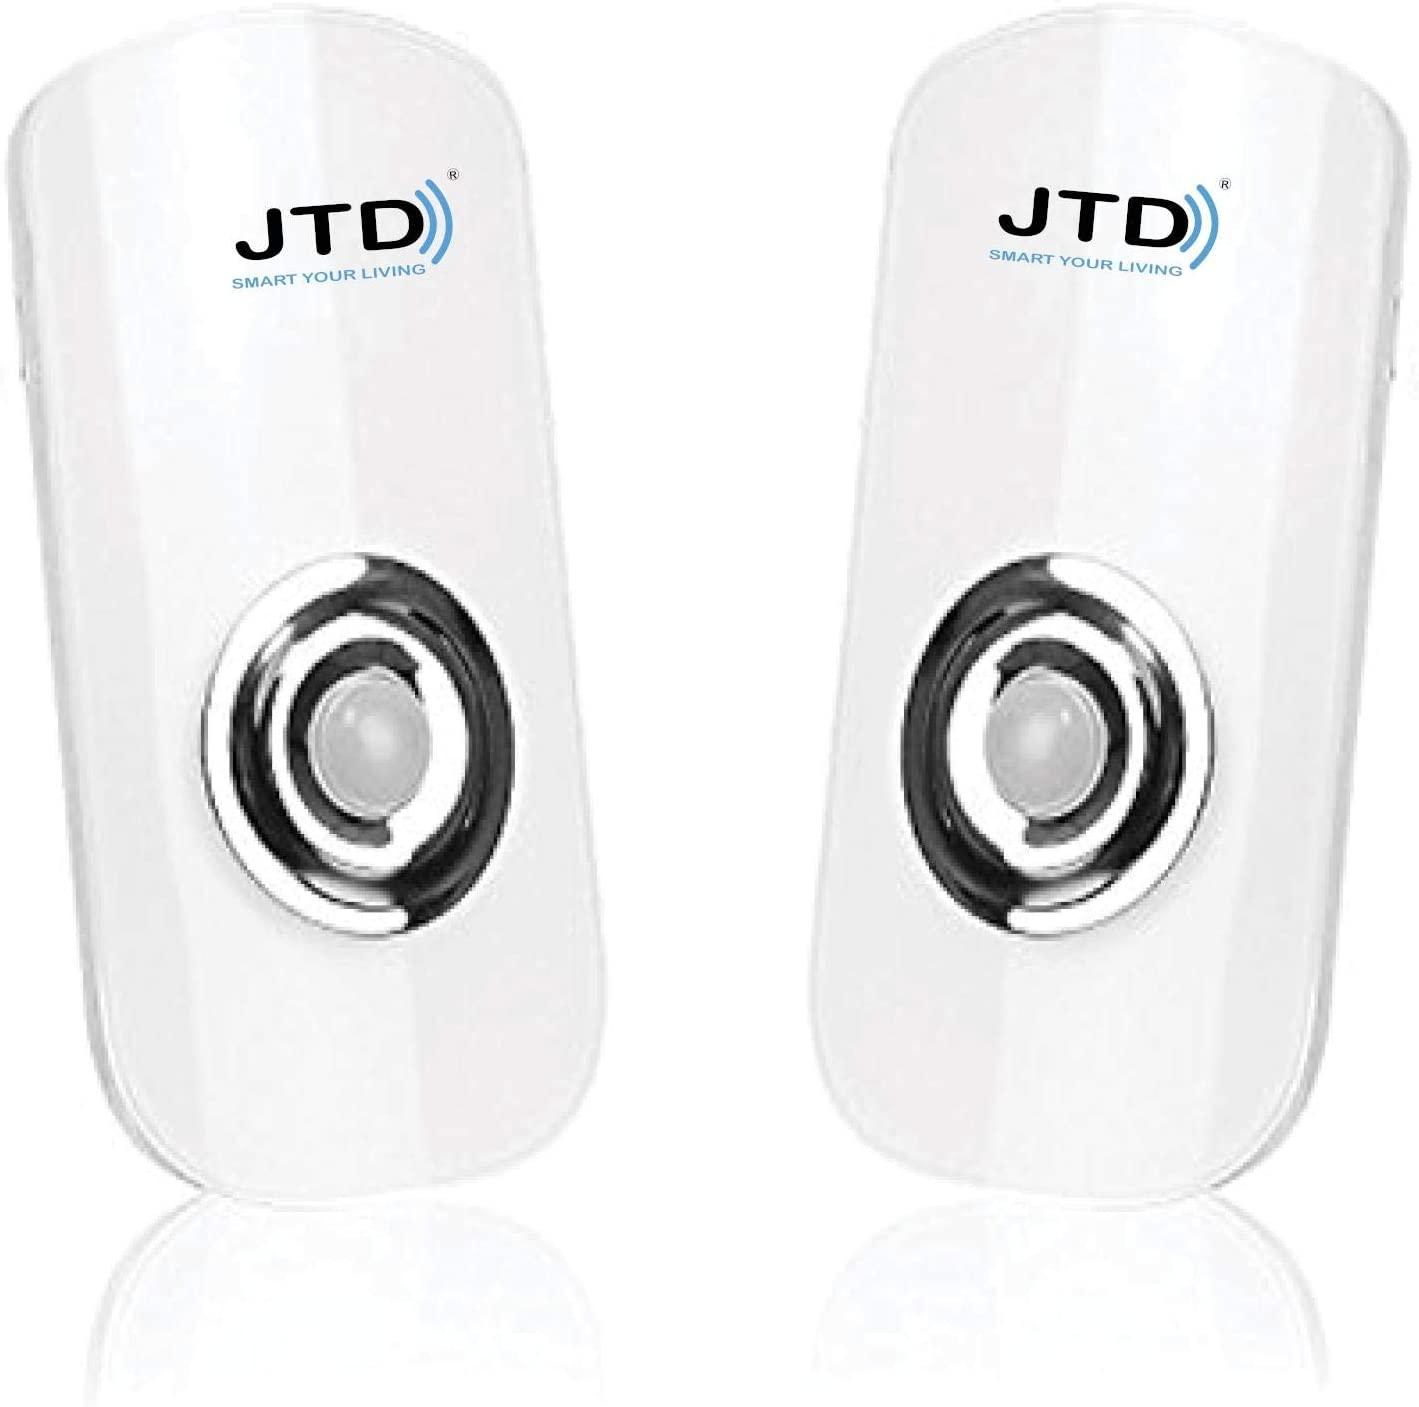 JTD Smart Energy-efficient LED Night Light Motion Auto Sensing LED Lights Motion Sensor Flashlight Rechargeable Emergency Light (2 Pack)